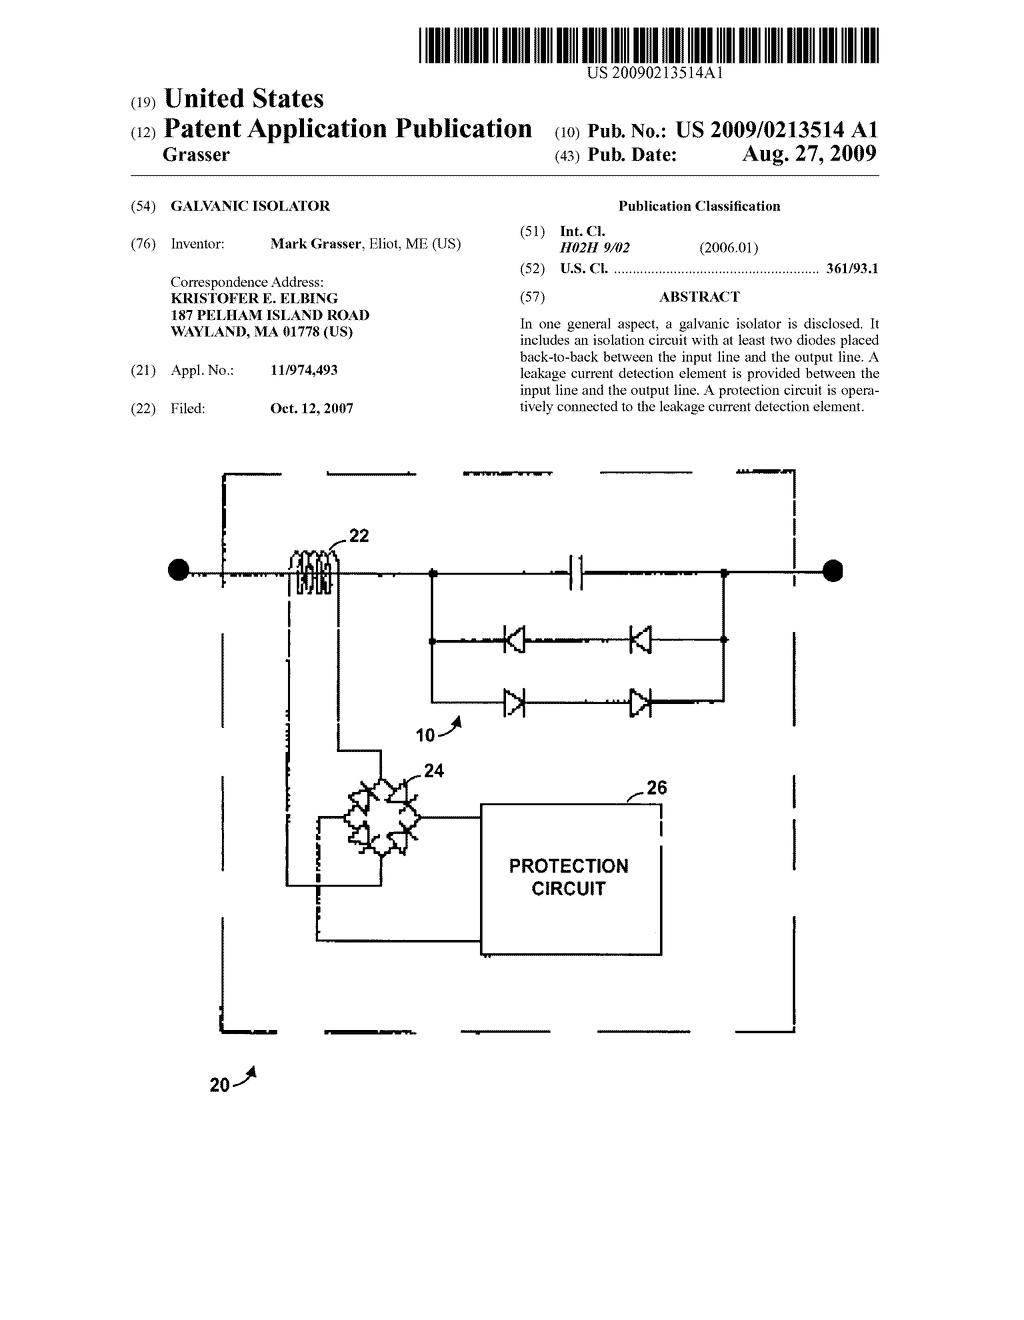 Galvanic isolator - diagram, schematic, and image 01 on